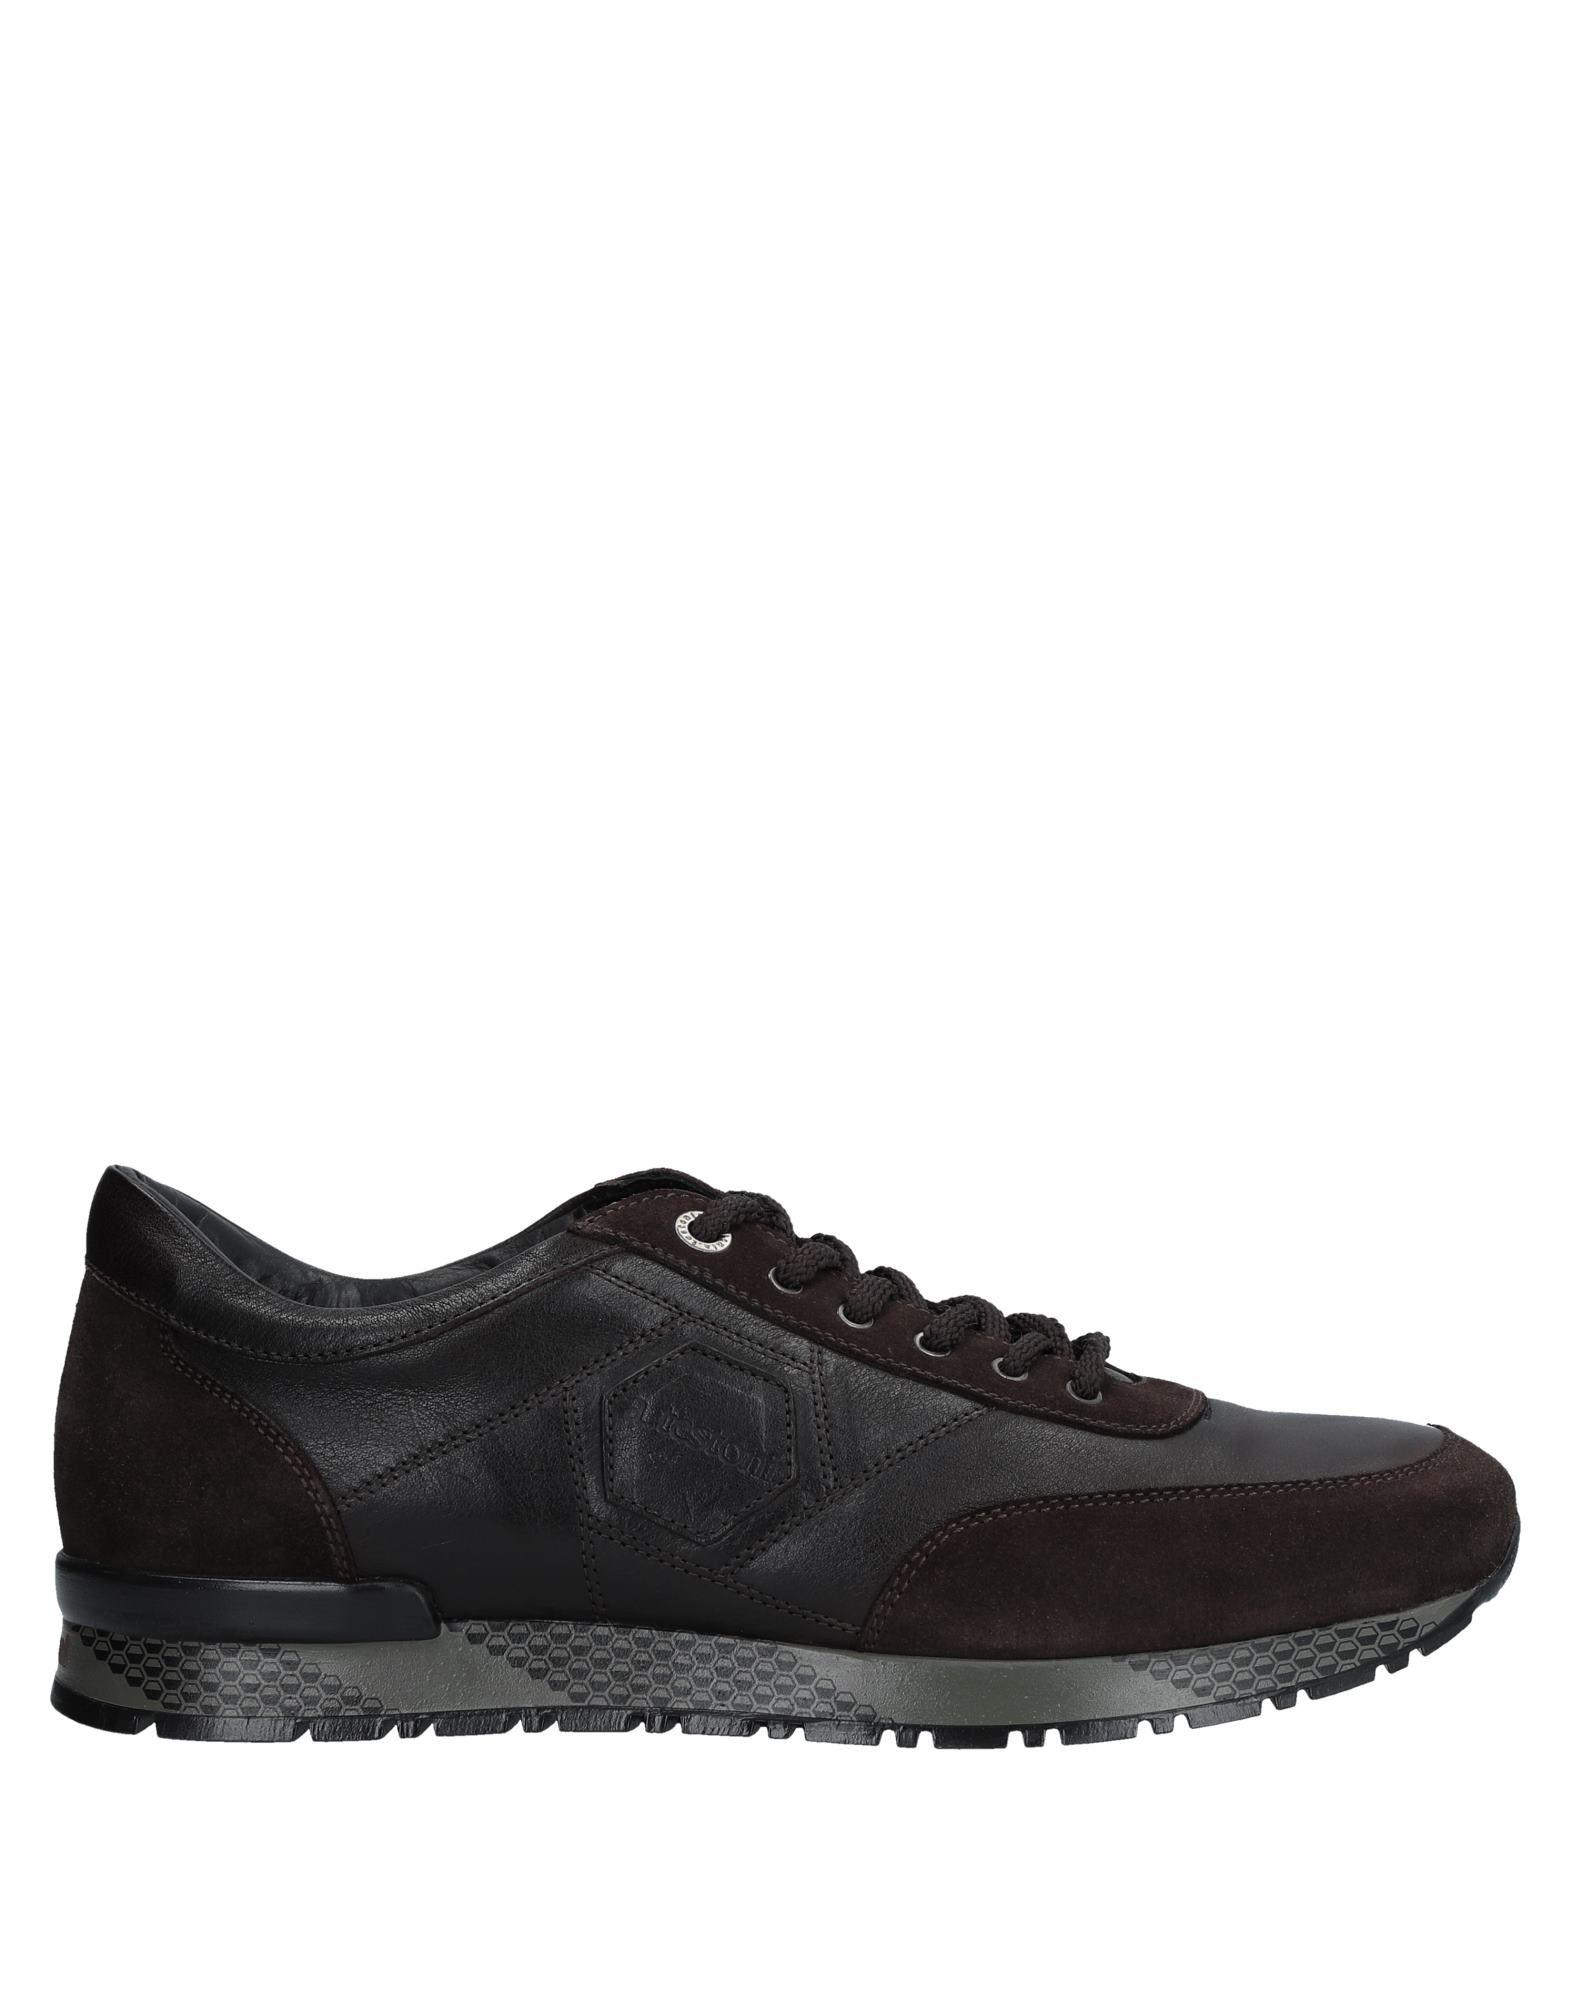 A.Testoni Sneakers Herren  11543130BM Gute Qualität beliebte Schuhe